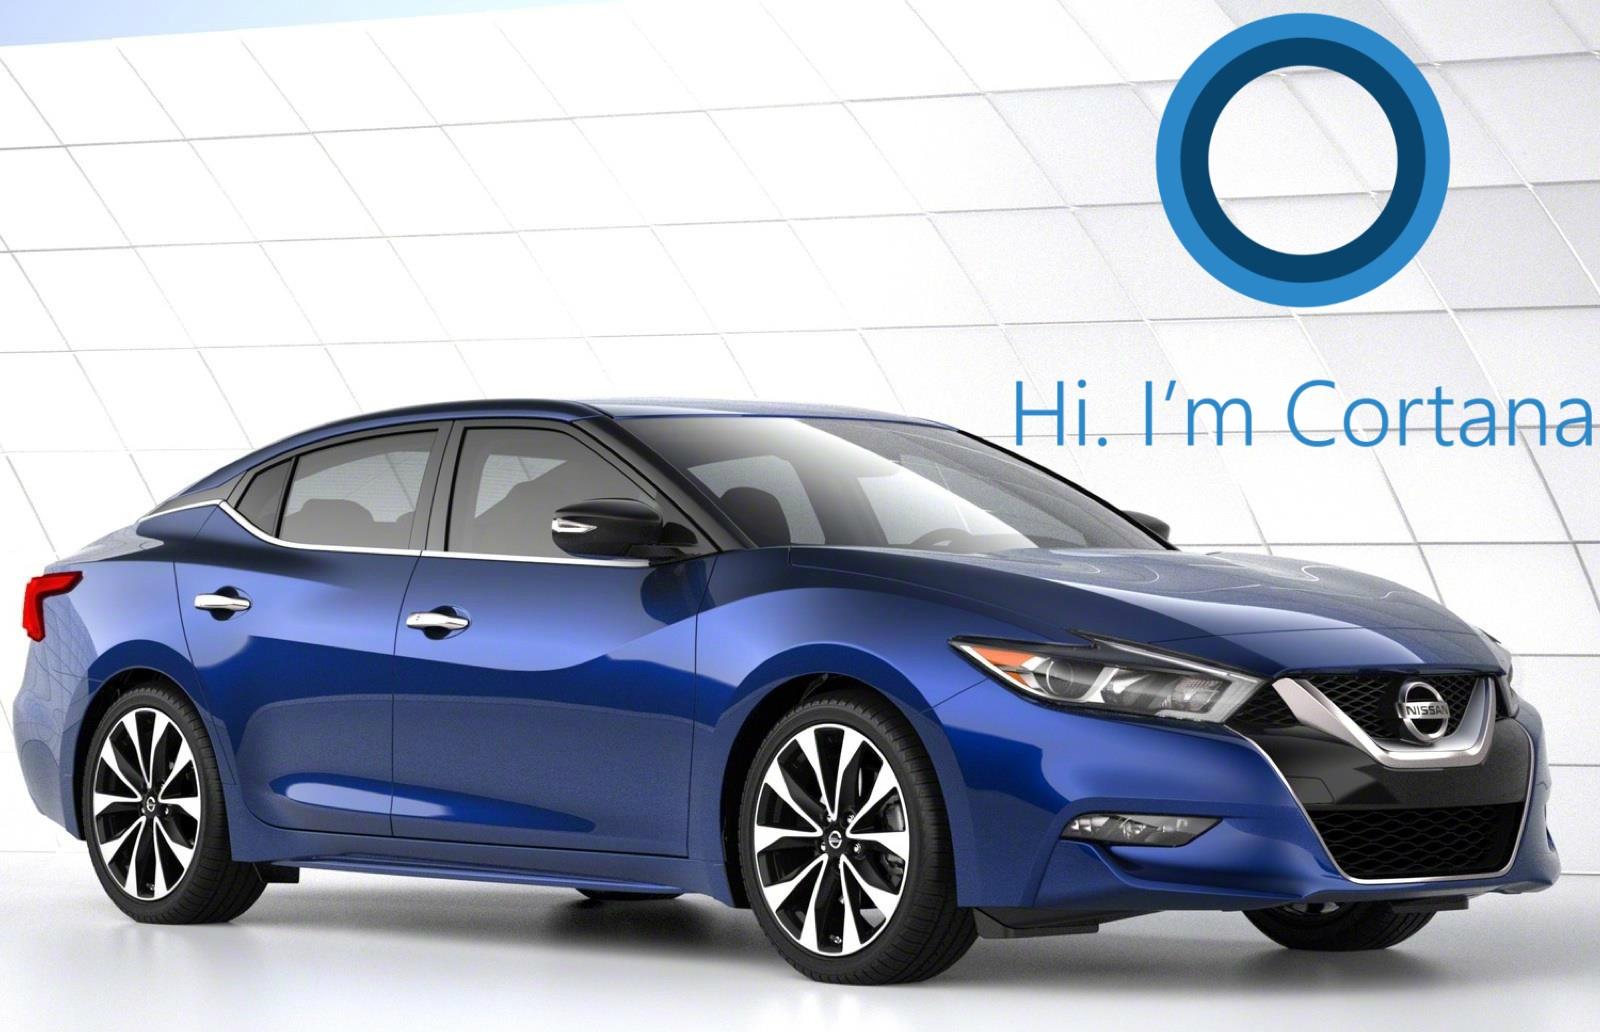 """Hola, Cortana"" será una frase para decir dentro de tu Nissan"